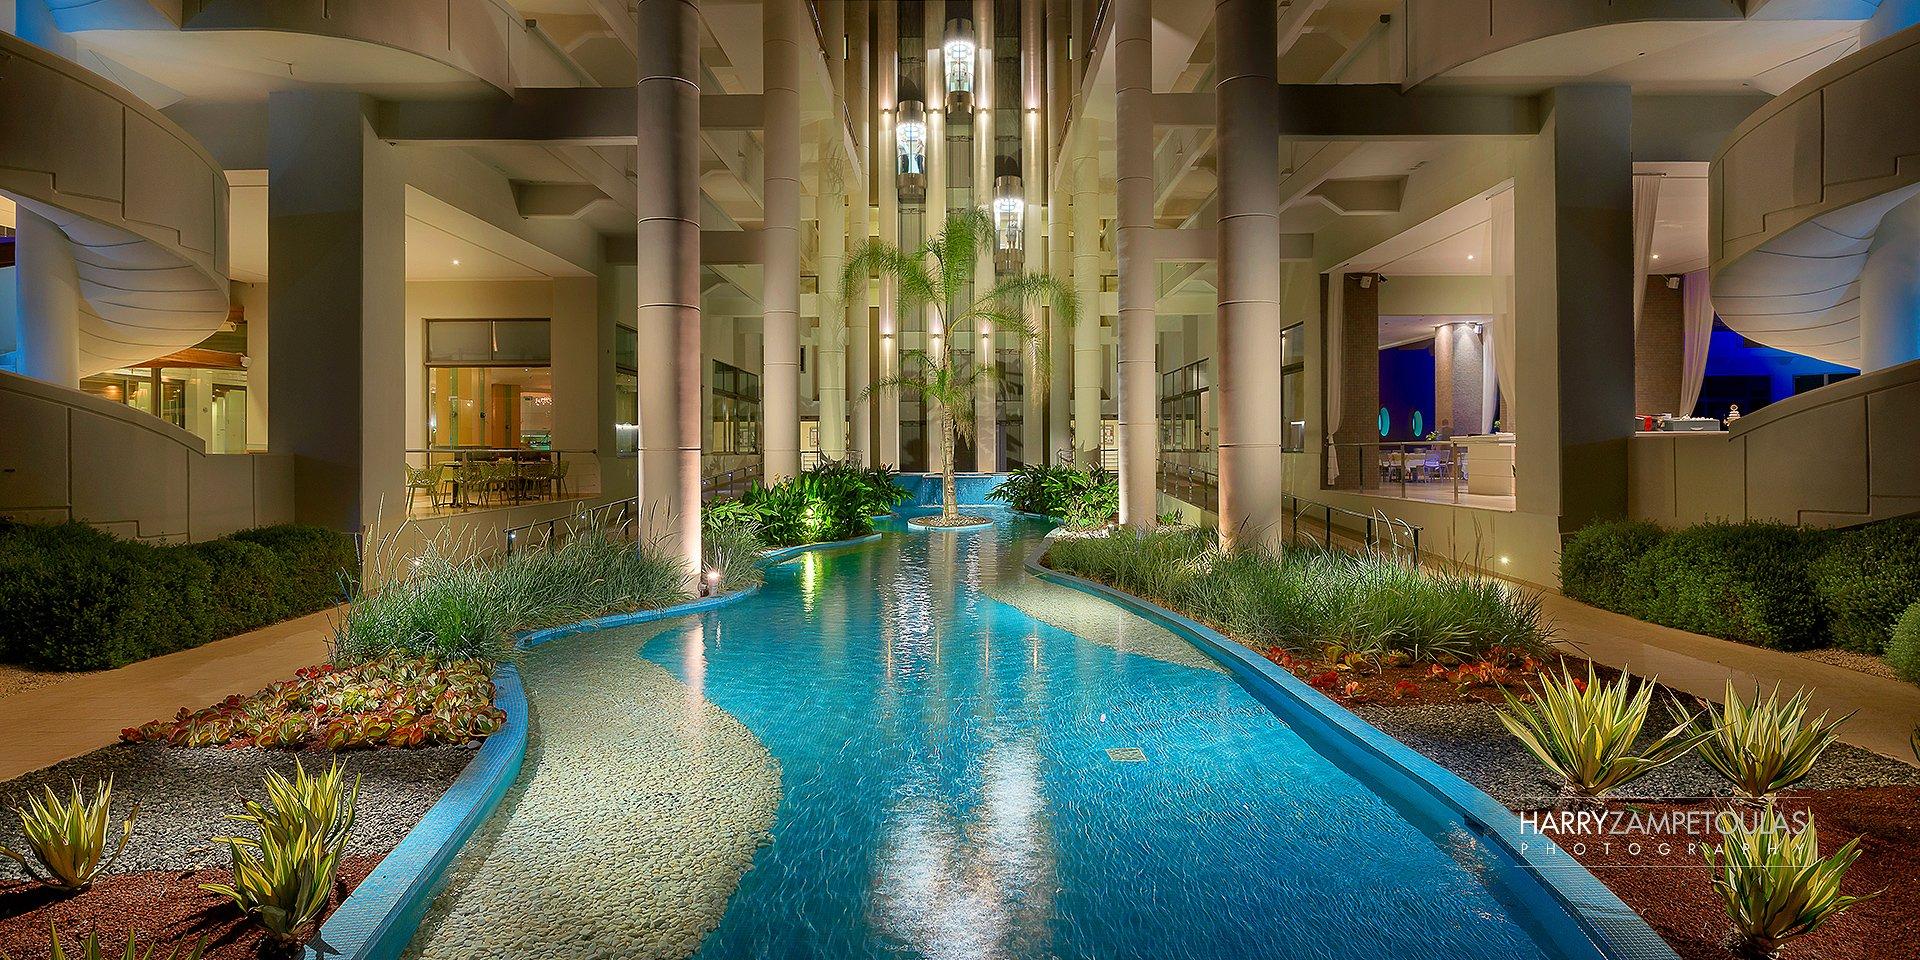 Elevators-1 Φωτογράφιση Ξενοδοχείων, καταλυμάτων, Κατοικιών, Villas. Google Street View Trusted Photographer.